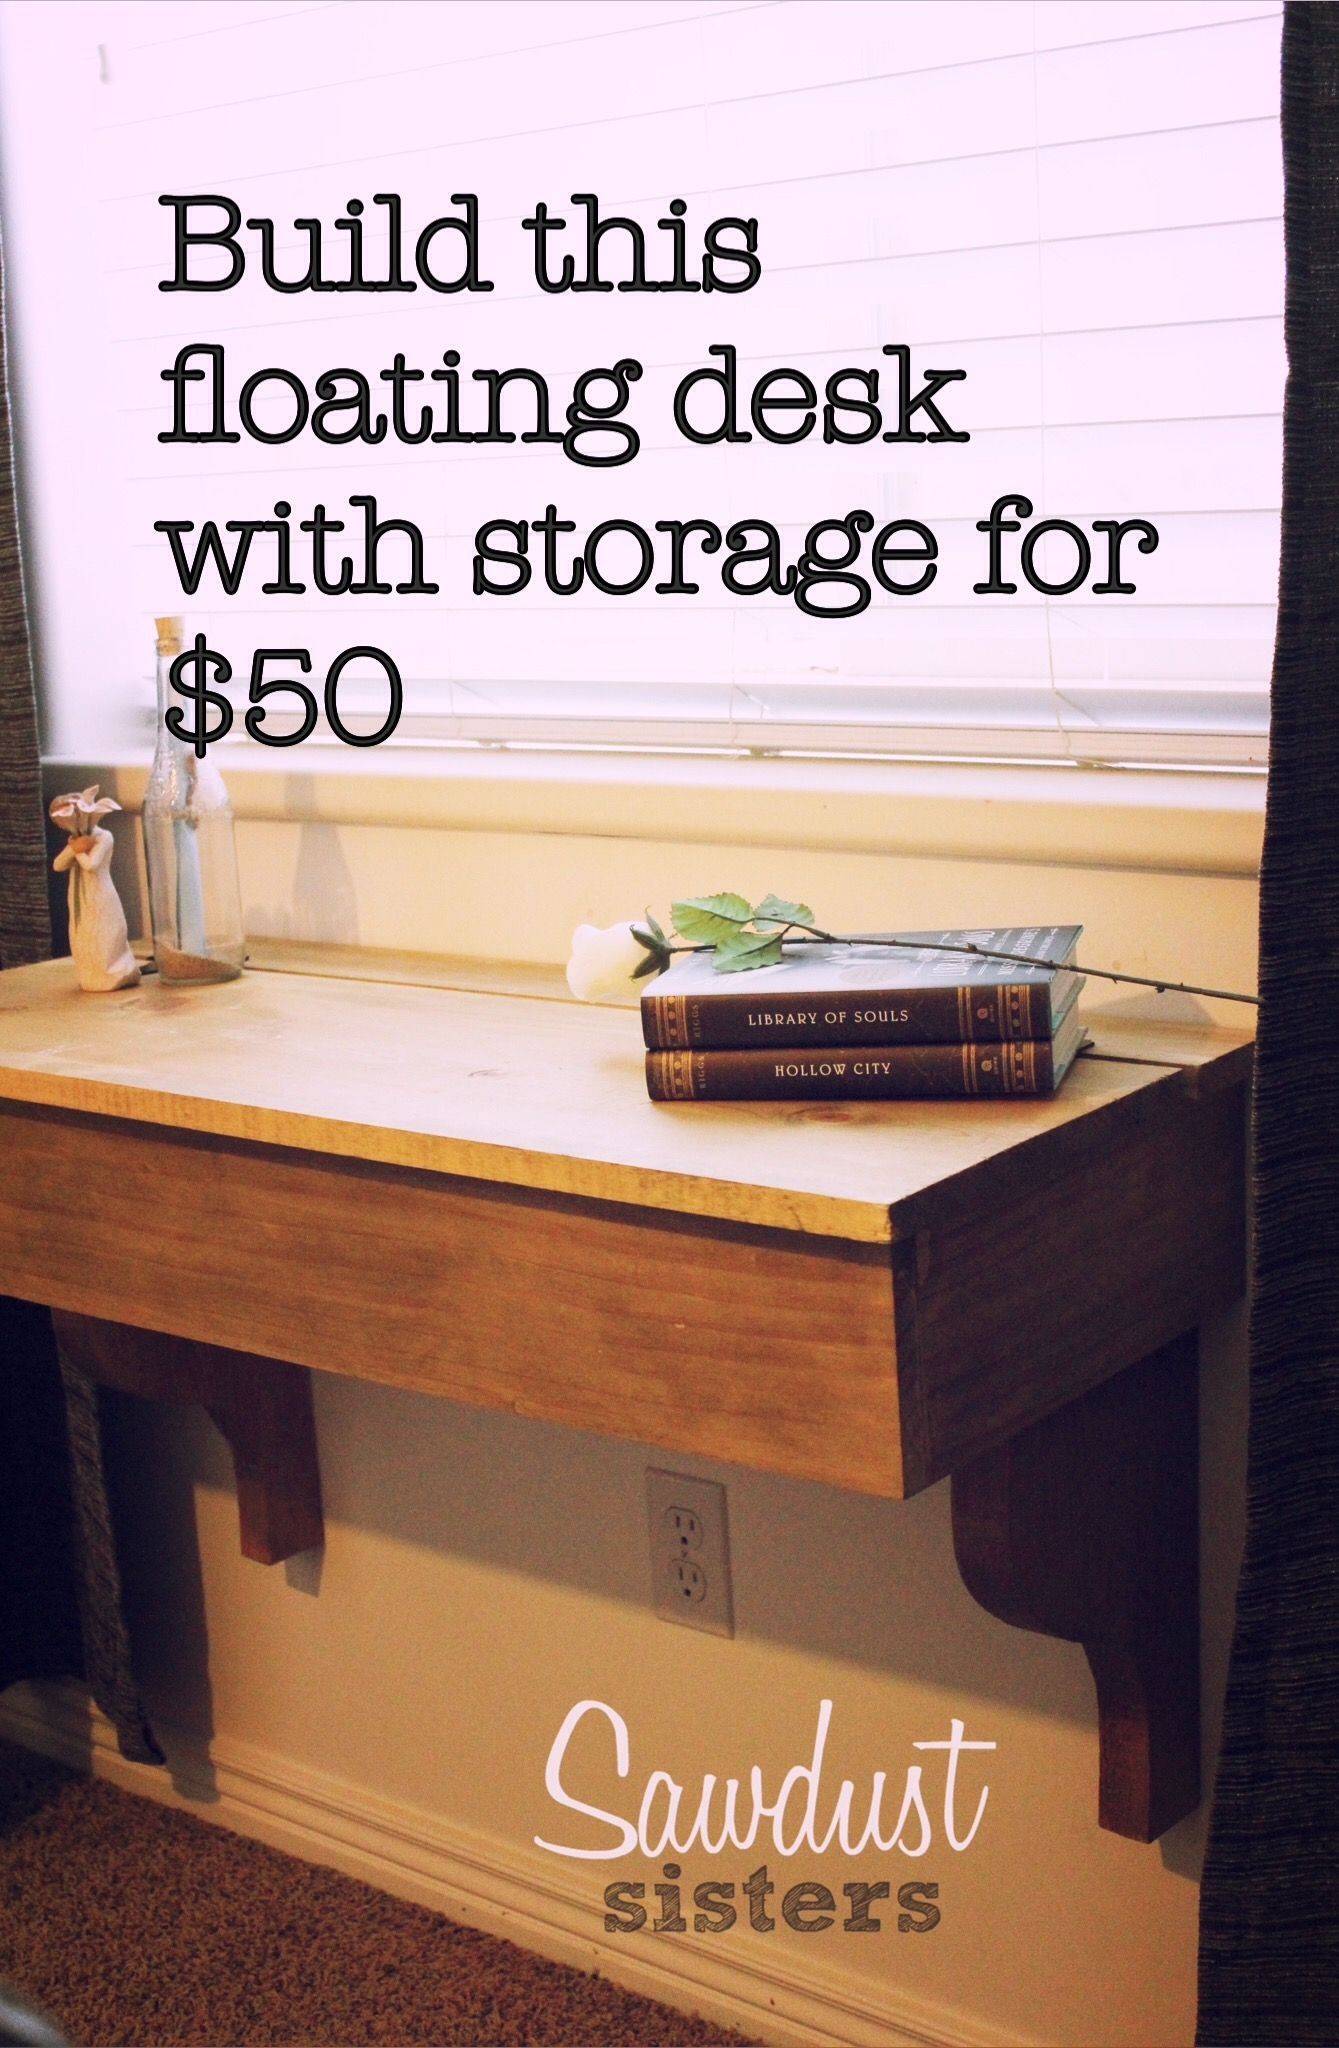 Diy Floating Desk Vanity With Storage Floating Desk Diy Furniture Plans Diy Furniture Projects